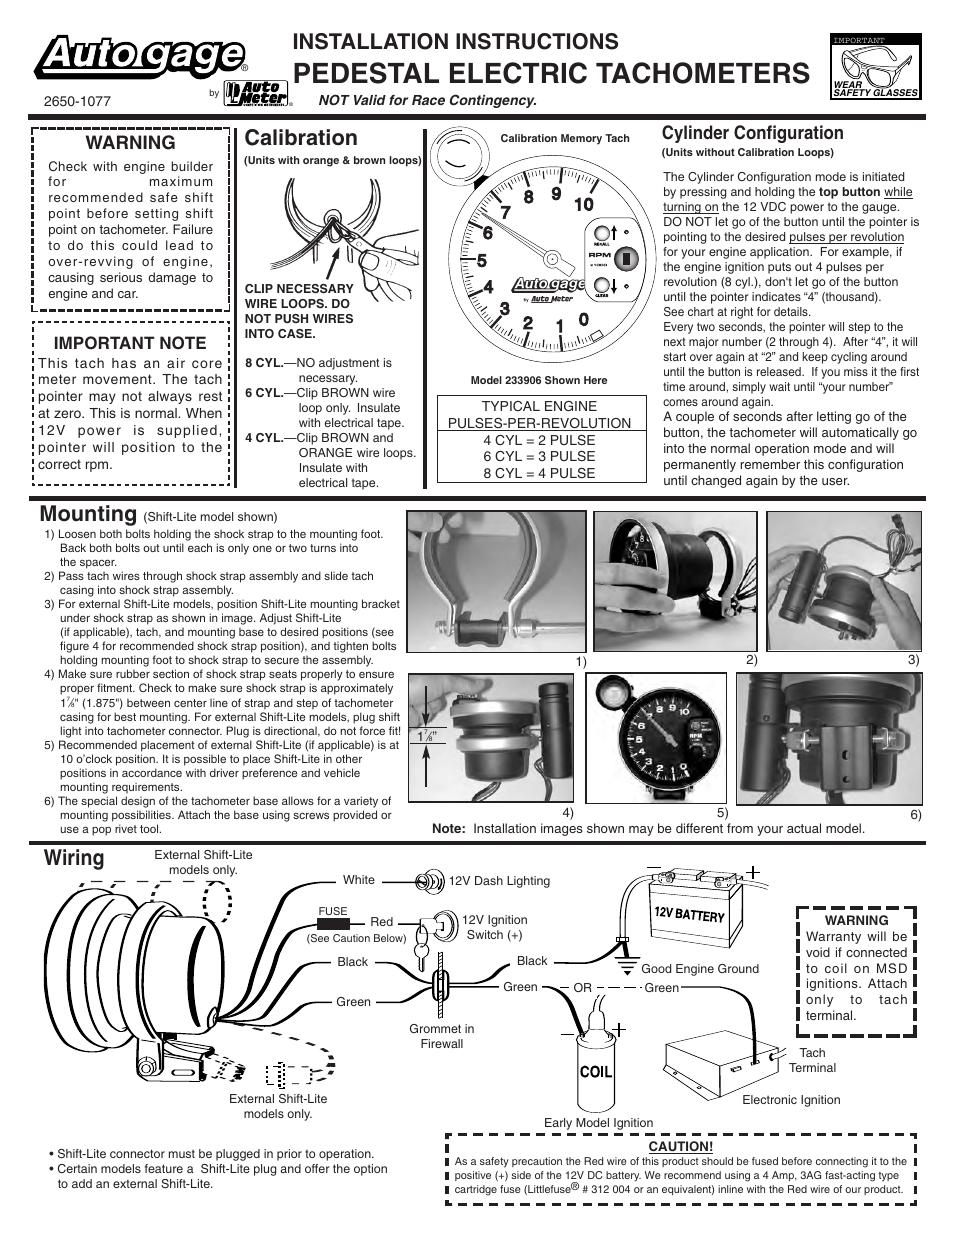 Memory Tach Wiring Diagram Change Your Idea With Gliderol Instructions Library Rh 17 Ayazagagrup Org 429371 Stewart Warner Tachometer Autogage